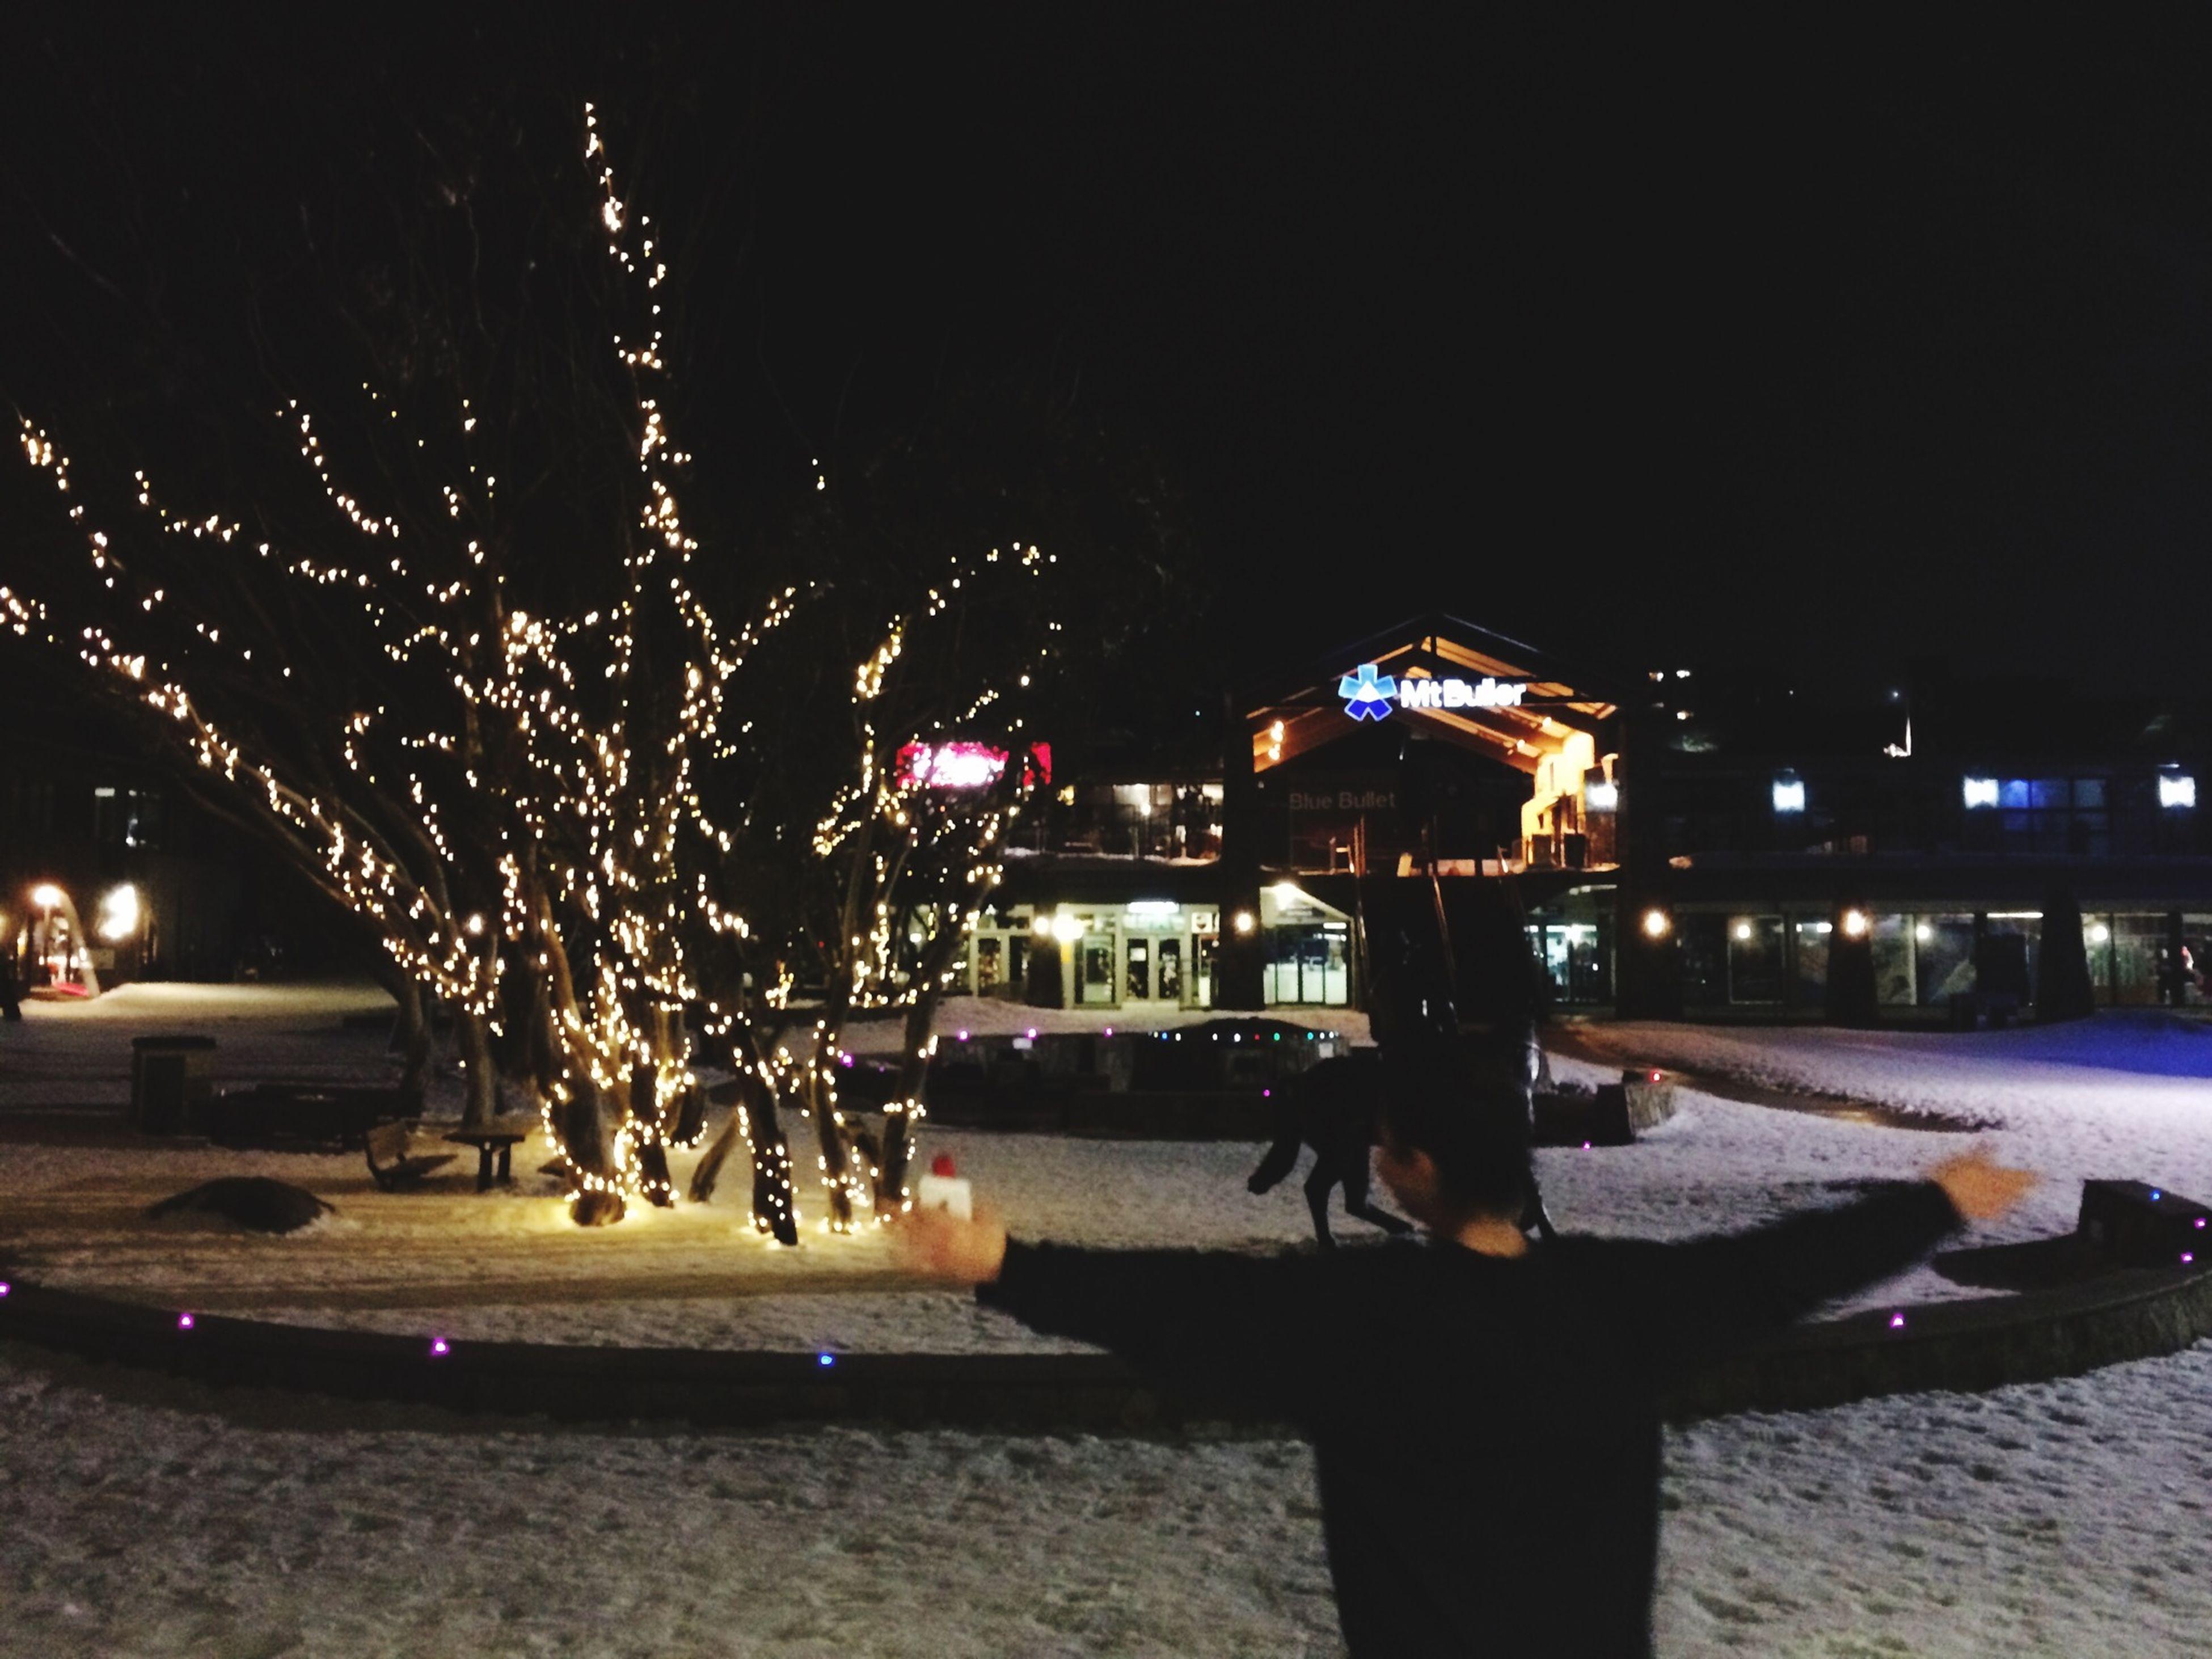 night, illuminated, building exterior, architecture, built structure, city, street light, lighting equipment, street, outdoors, sky, incidental people, city life, clear sky, dark, light - natural phenomenon, tree, water